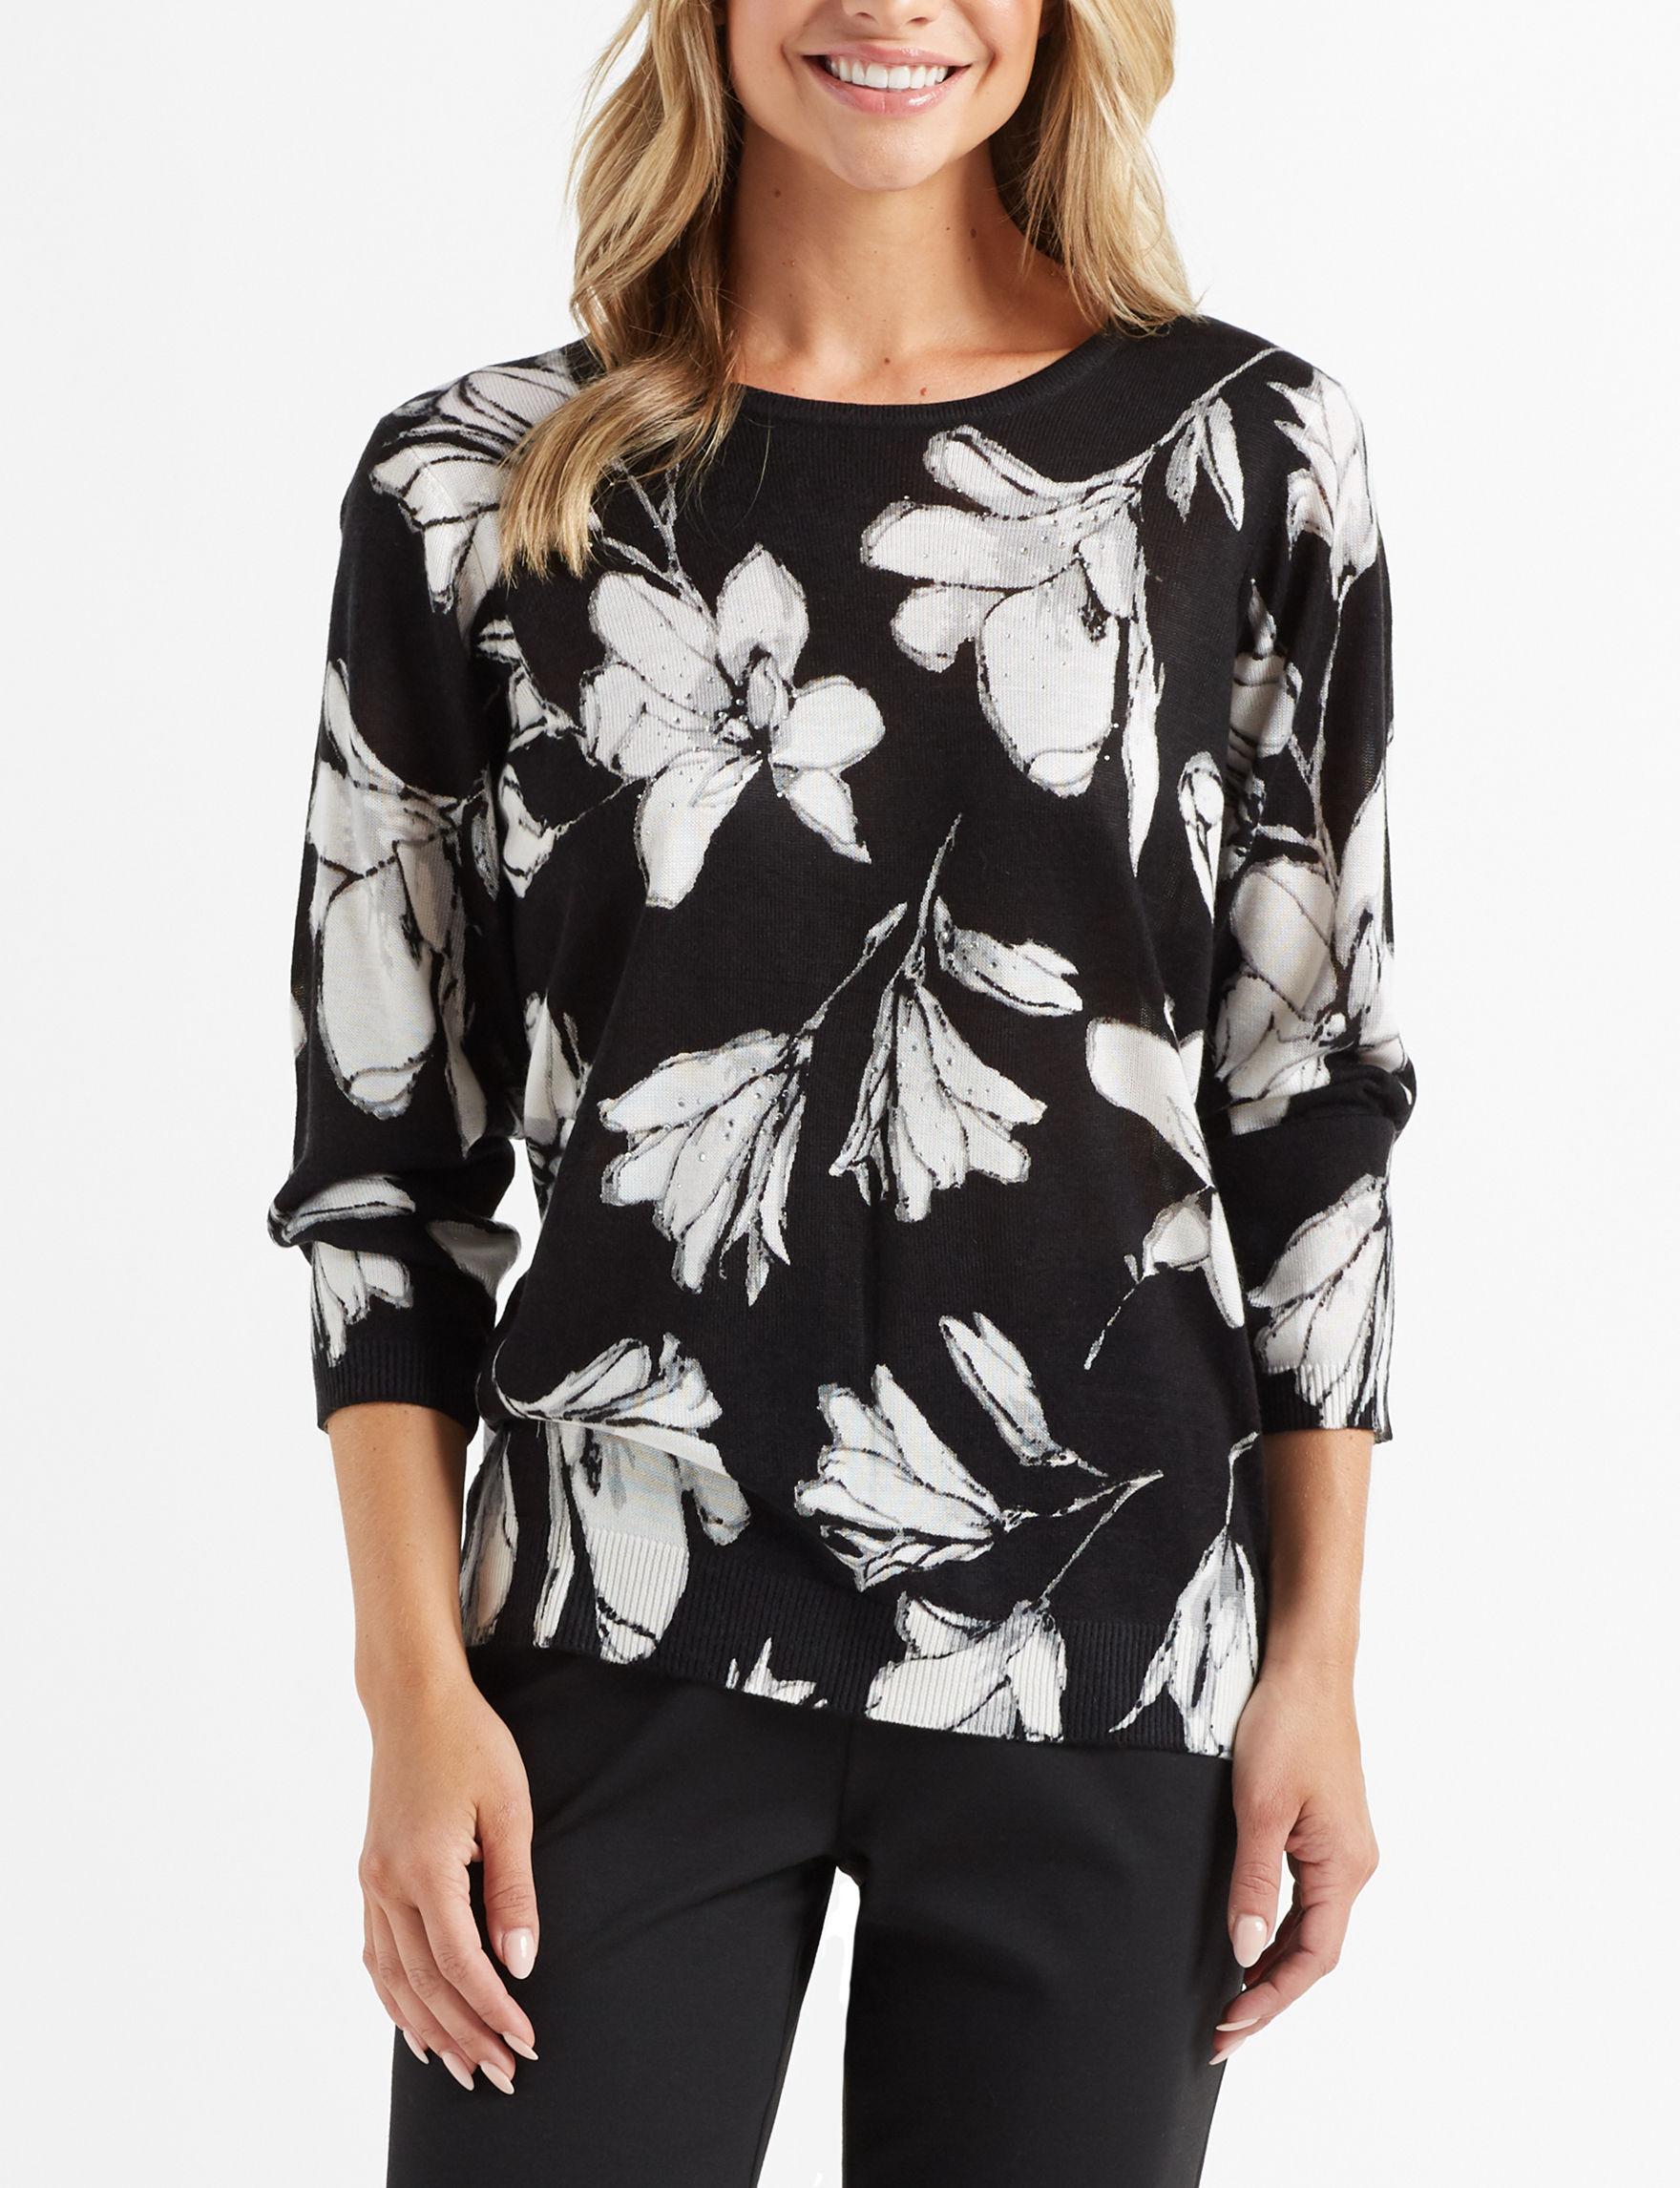 Cathy Daniels Black Floral